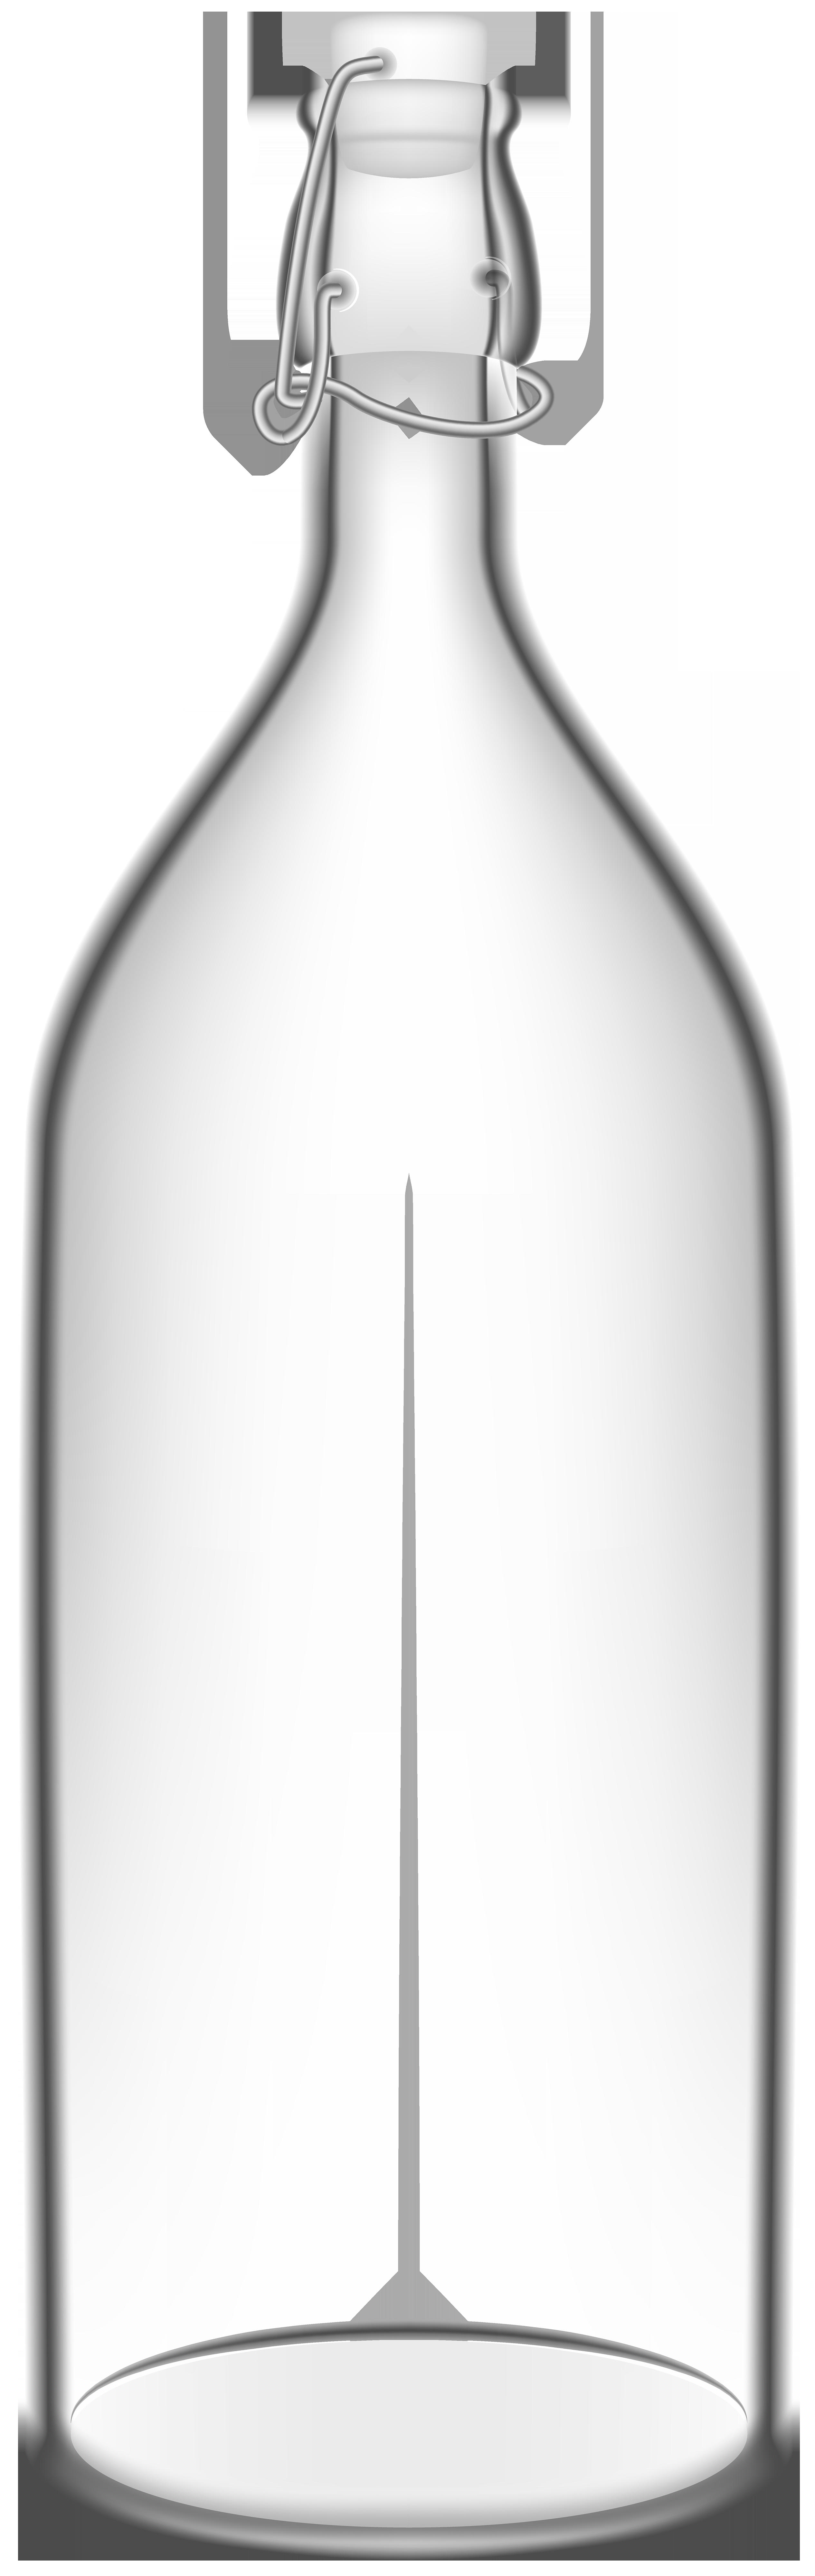 Png clip art best. Bottle clipart glass bottle